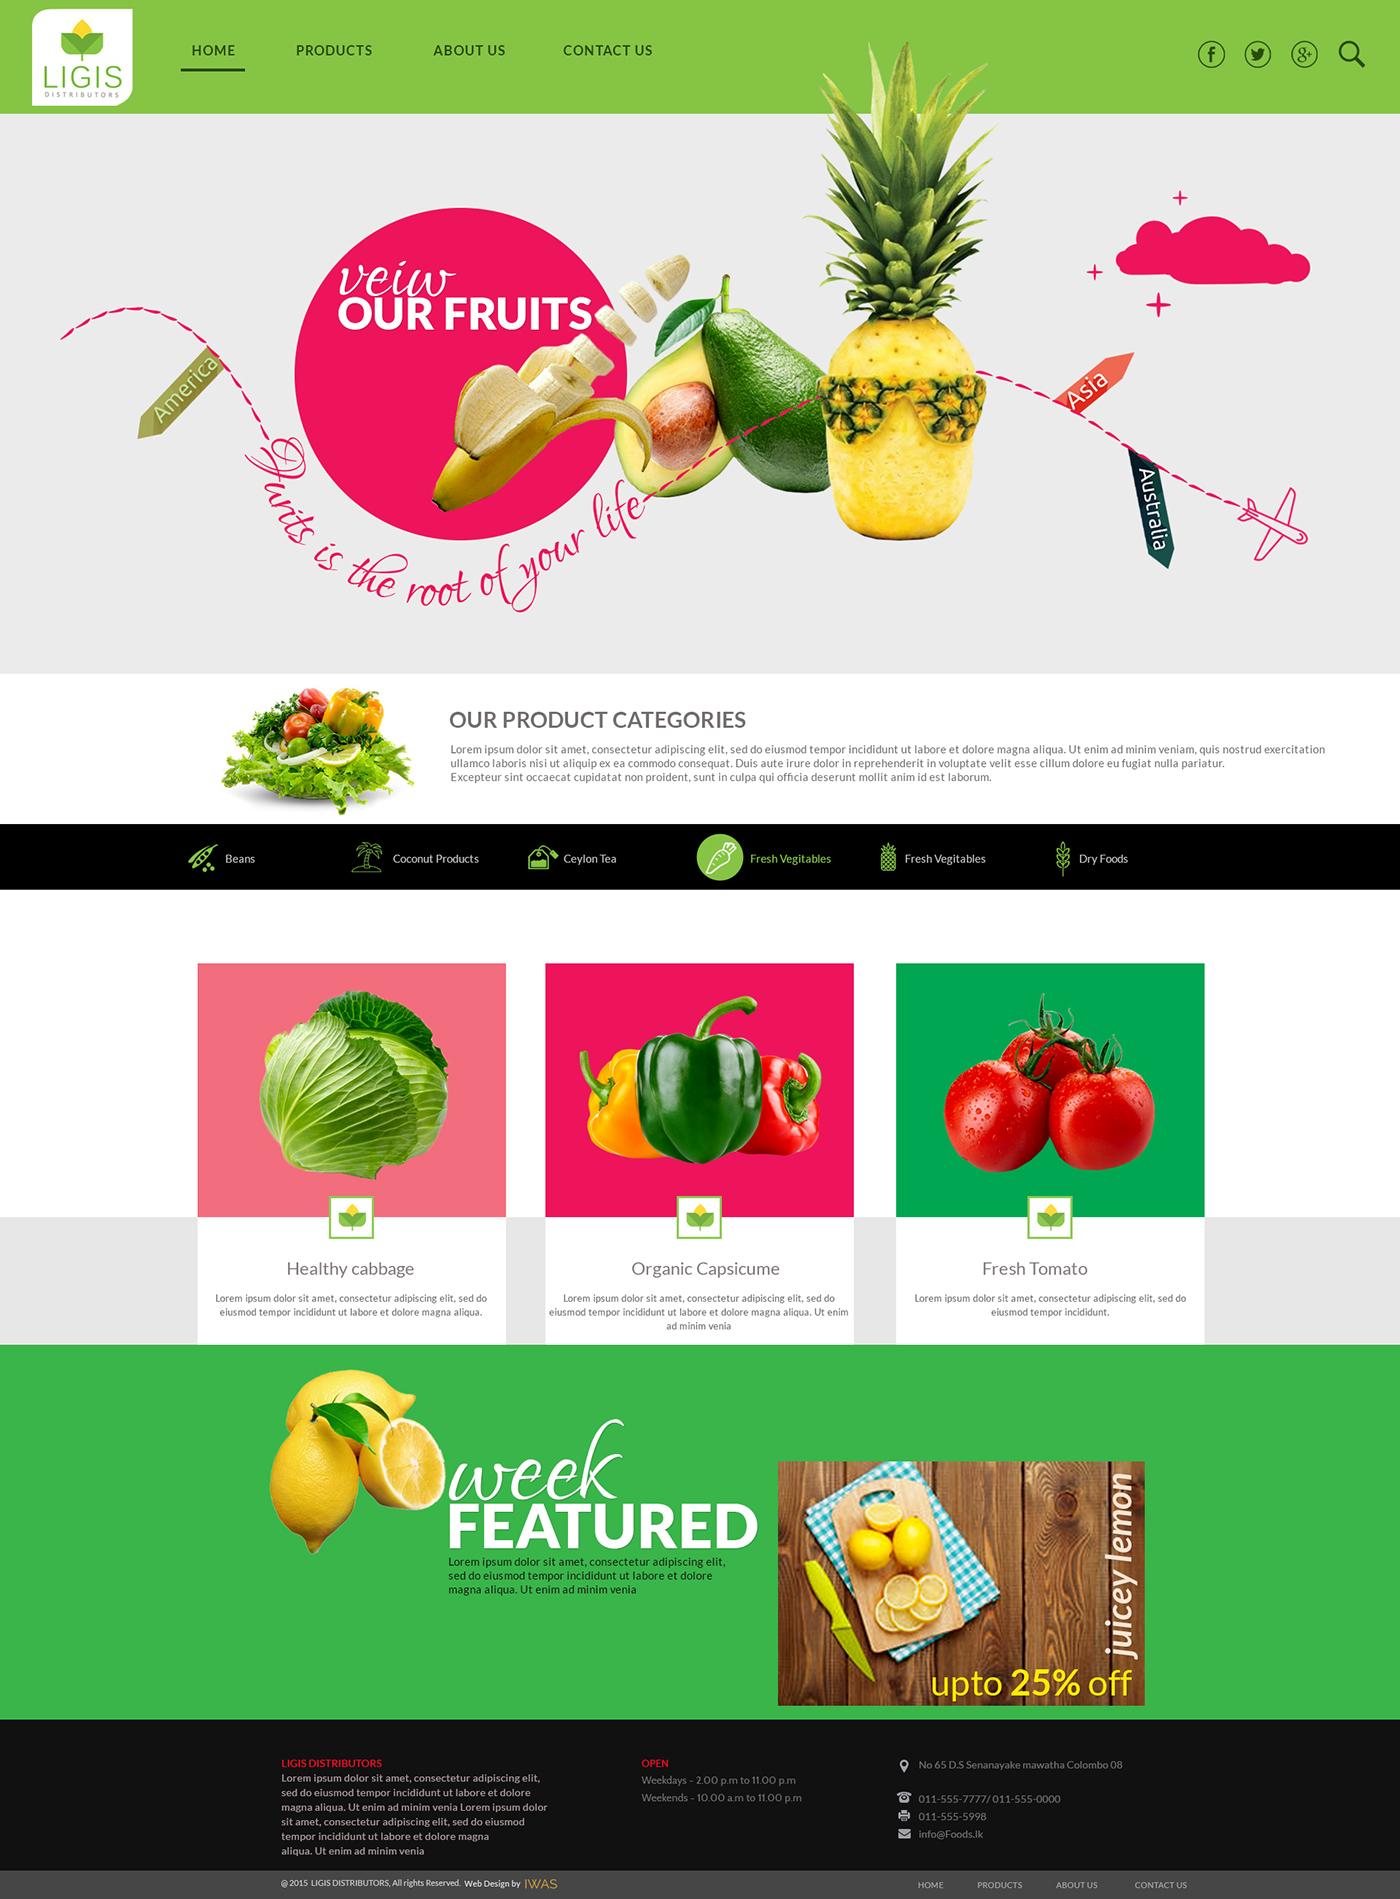 Foods export company UI on Behance